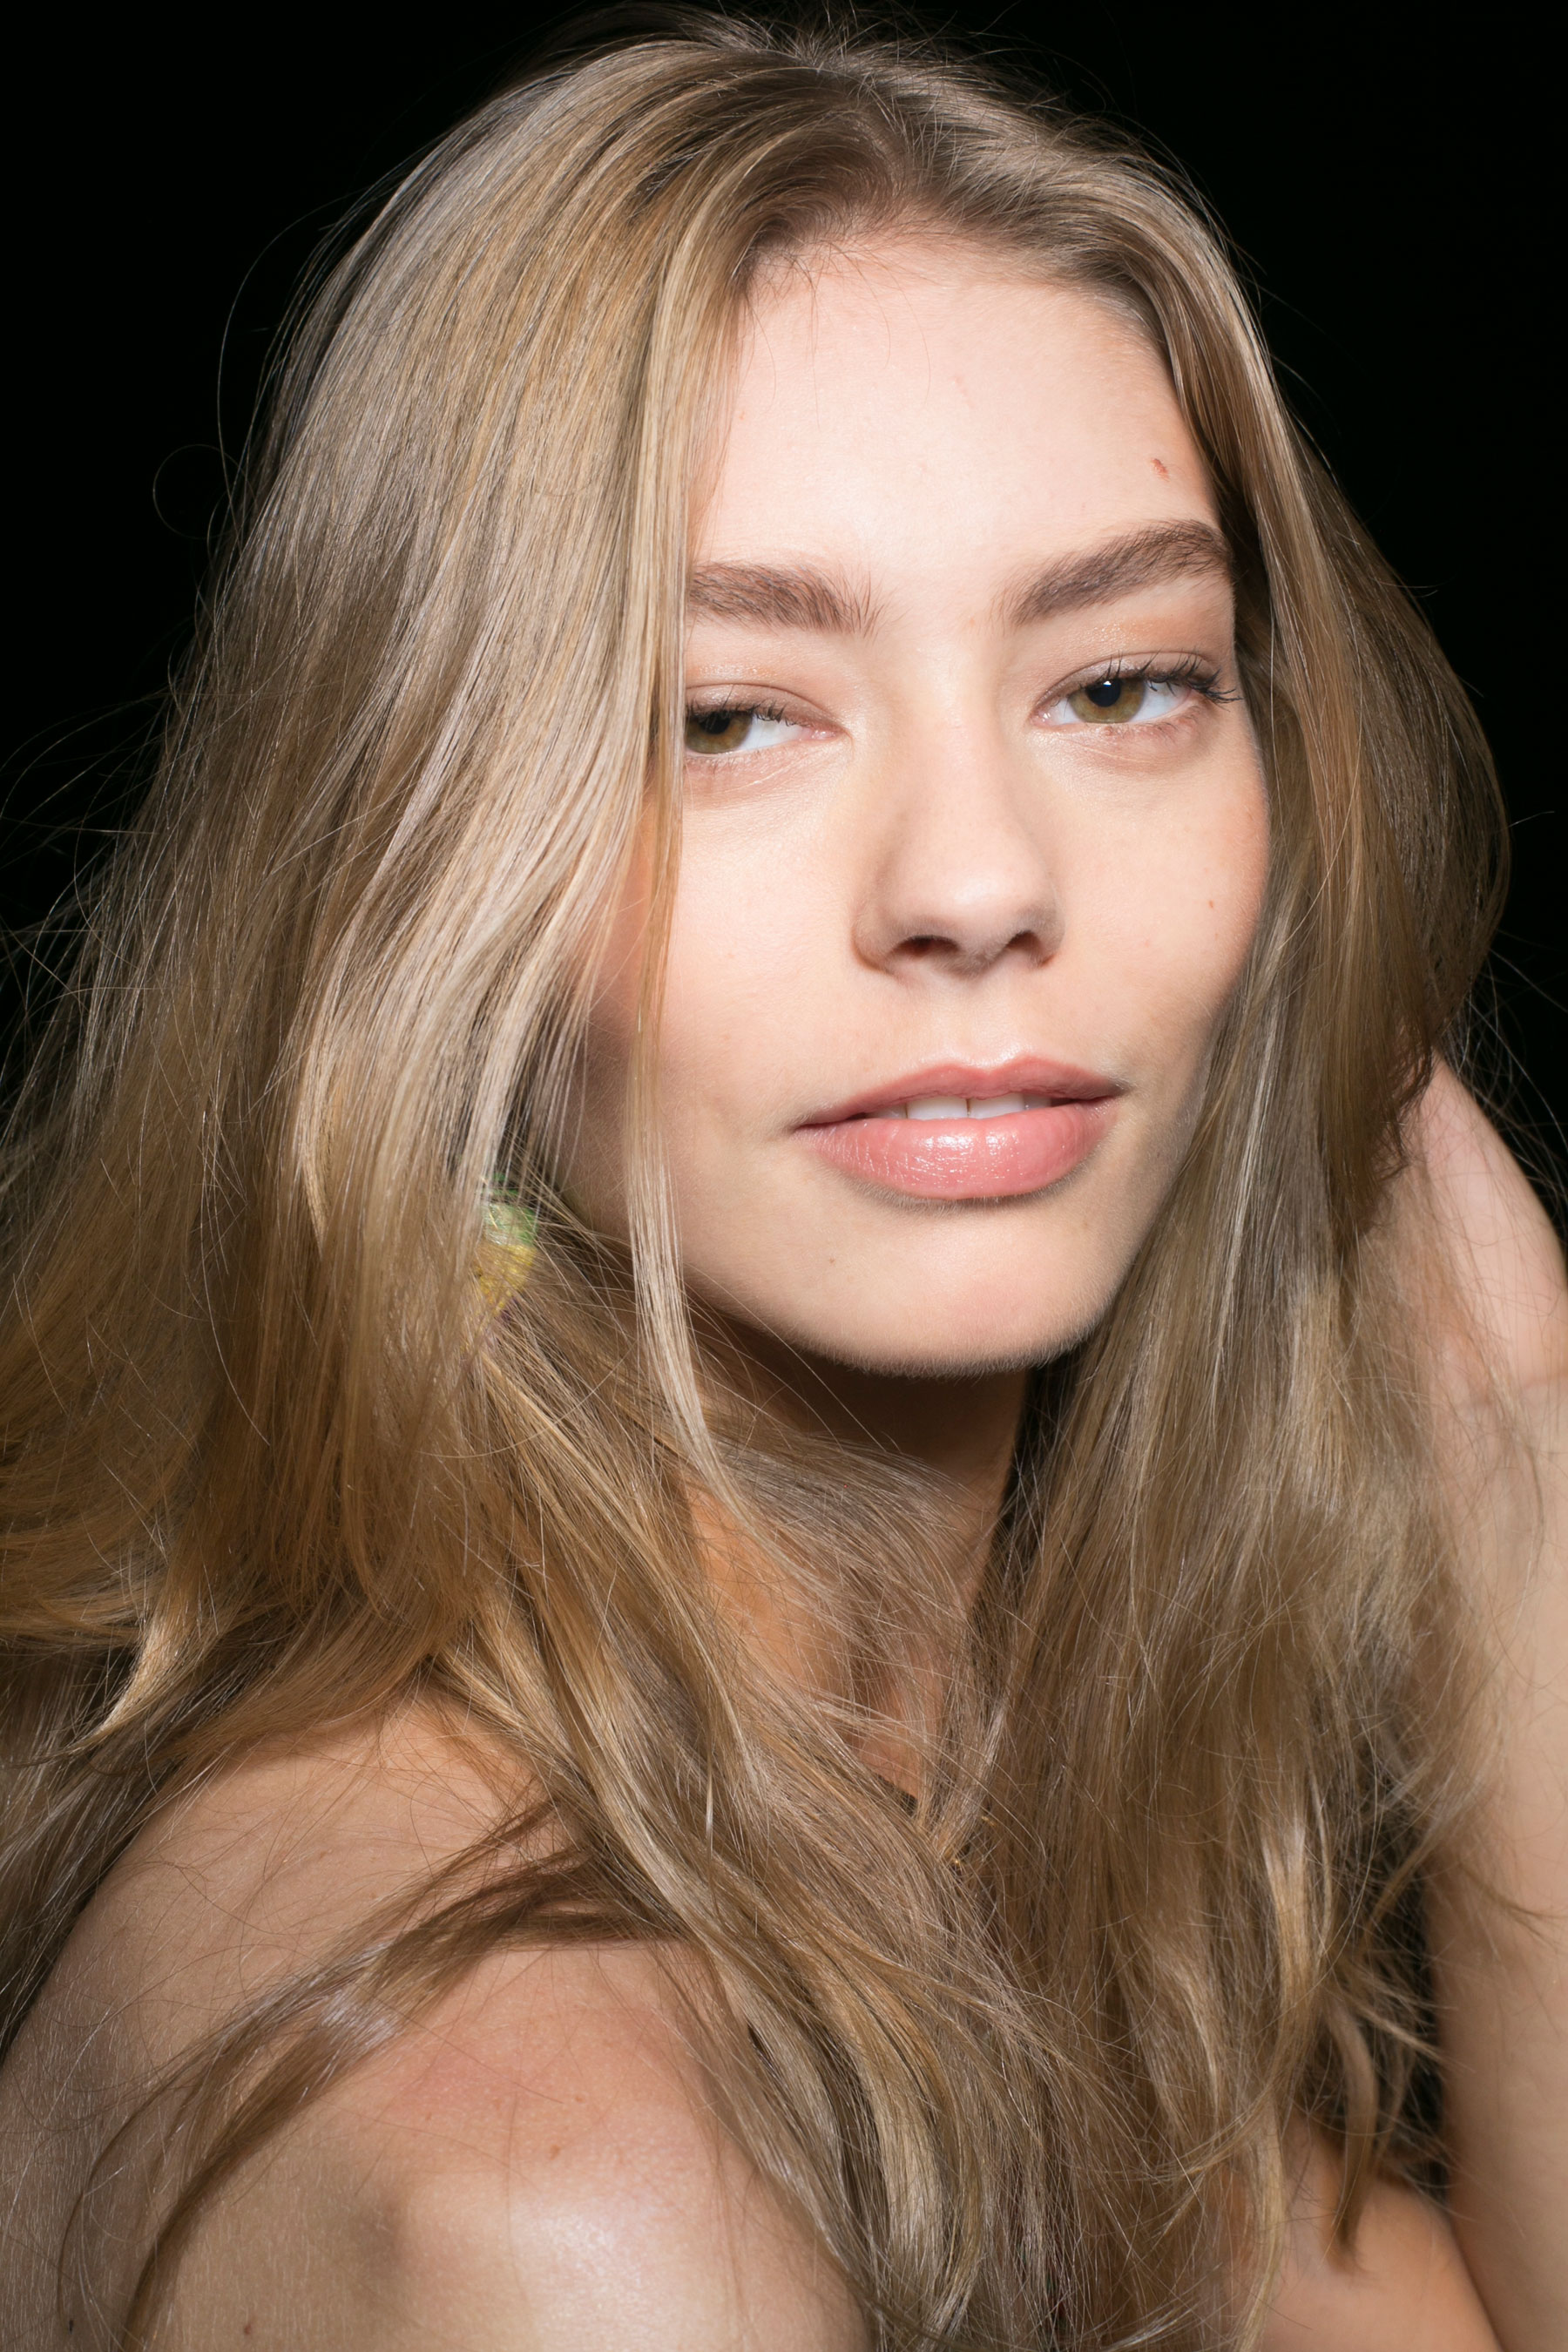 tommy-hilfiger-beautyspring-2016-fashion-show-the-impression-042